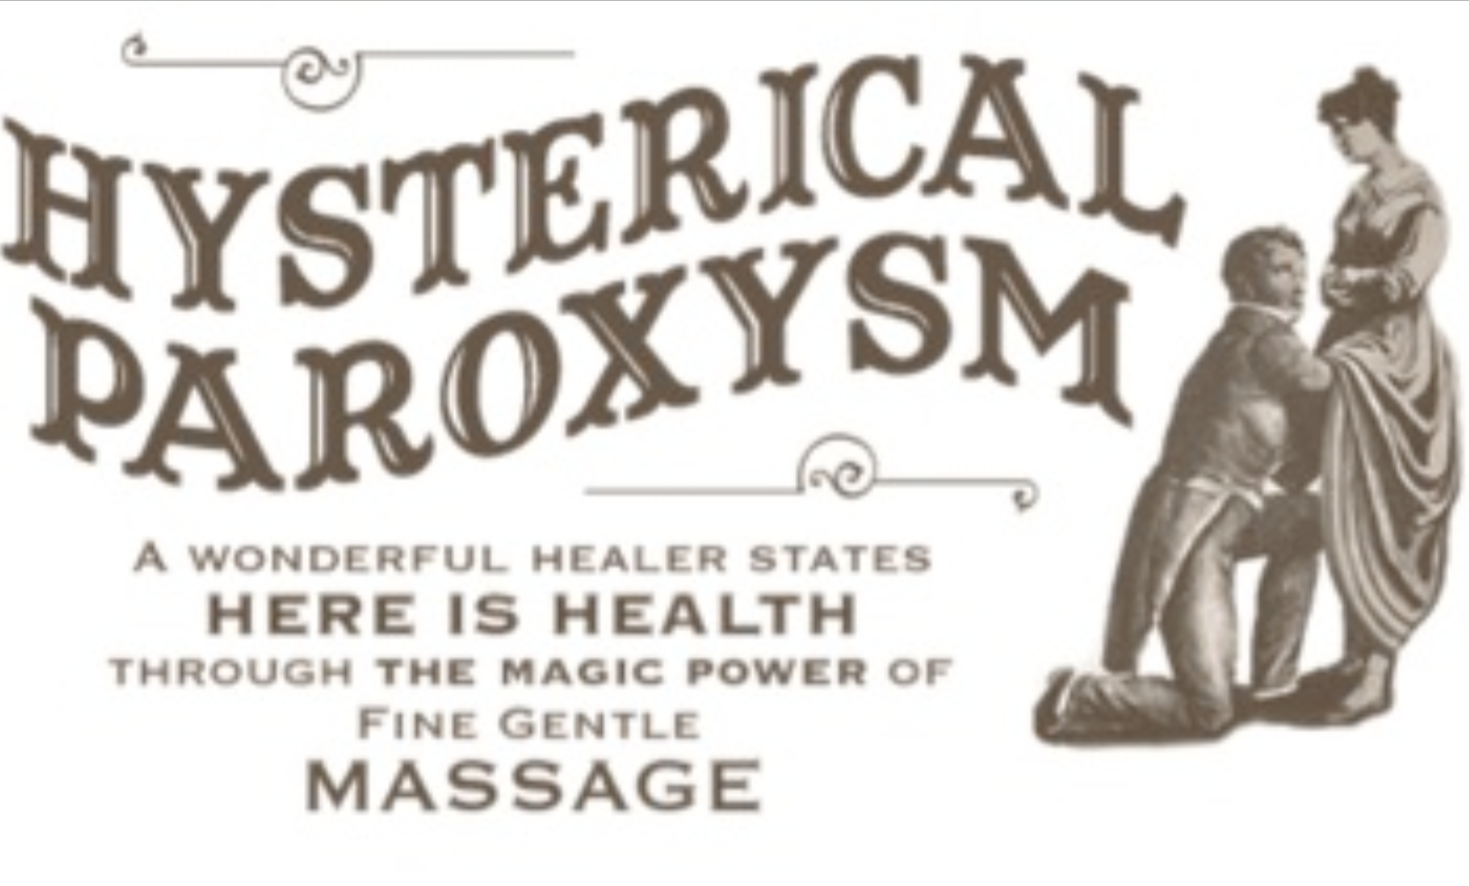 Vintage Hysterical Paroxysm Poster